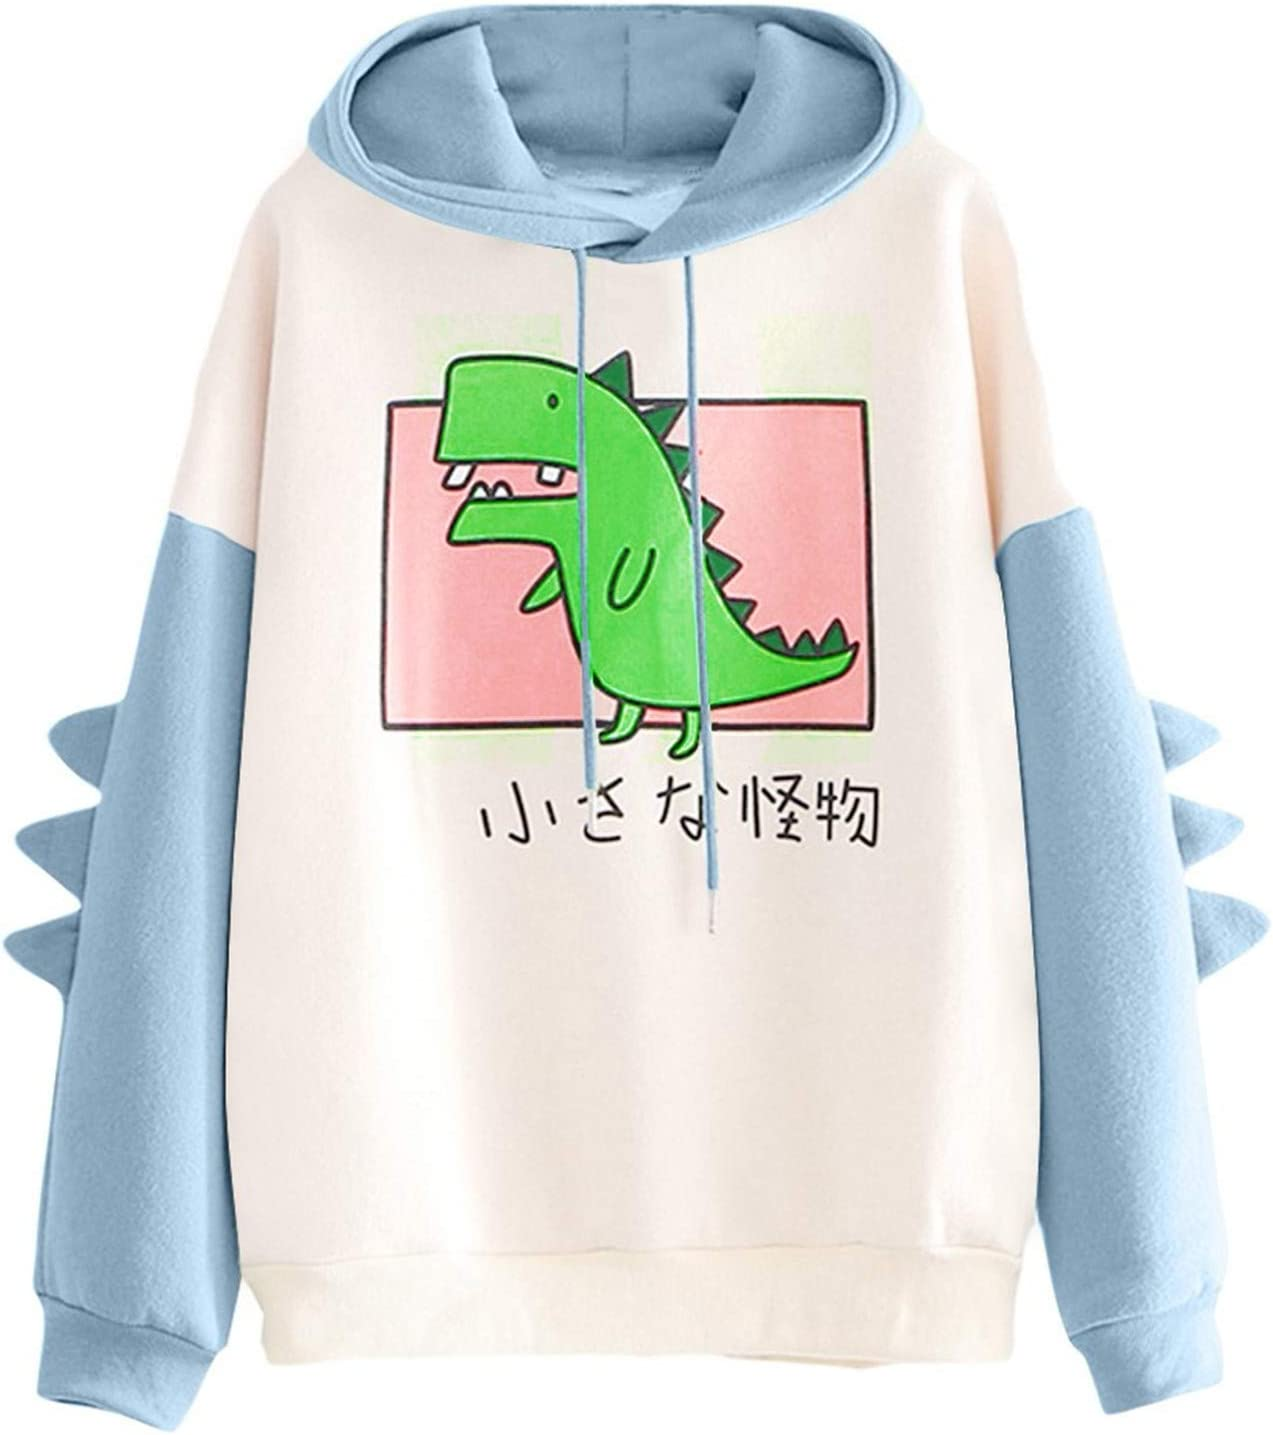 Eoailr Women Hoodies O-Neck San Francisco Mall Cute Cartoon Ranking integrated 1st place Cosplay Hoodi Dinosaur